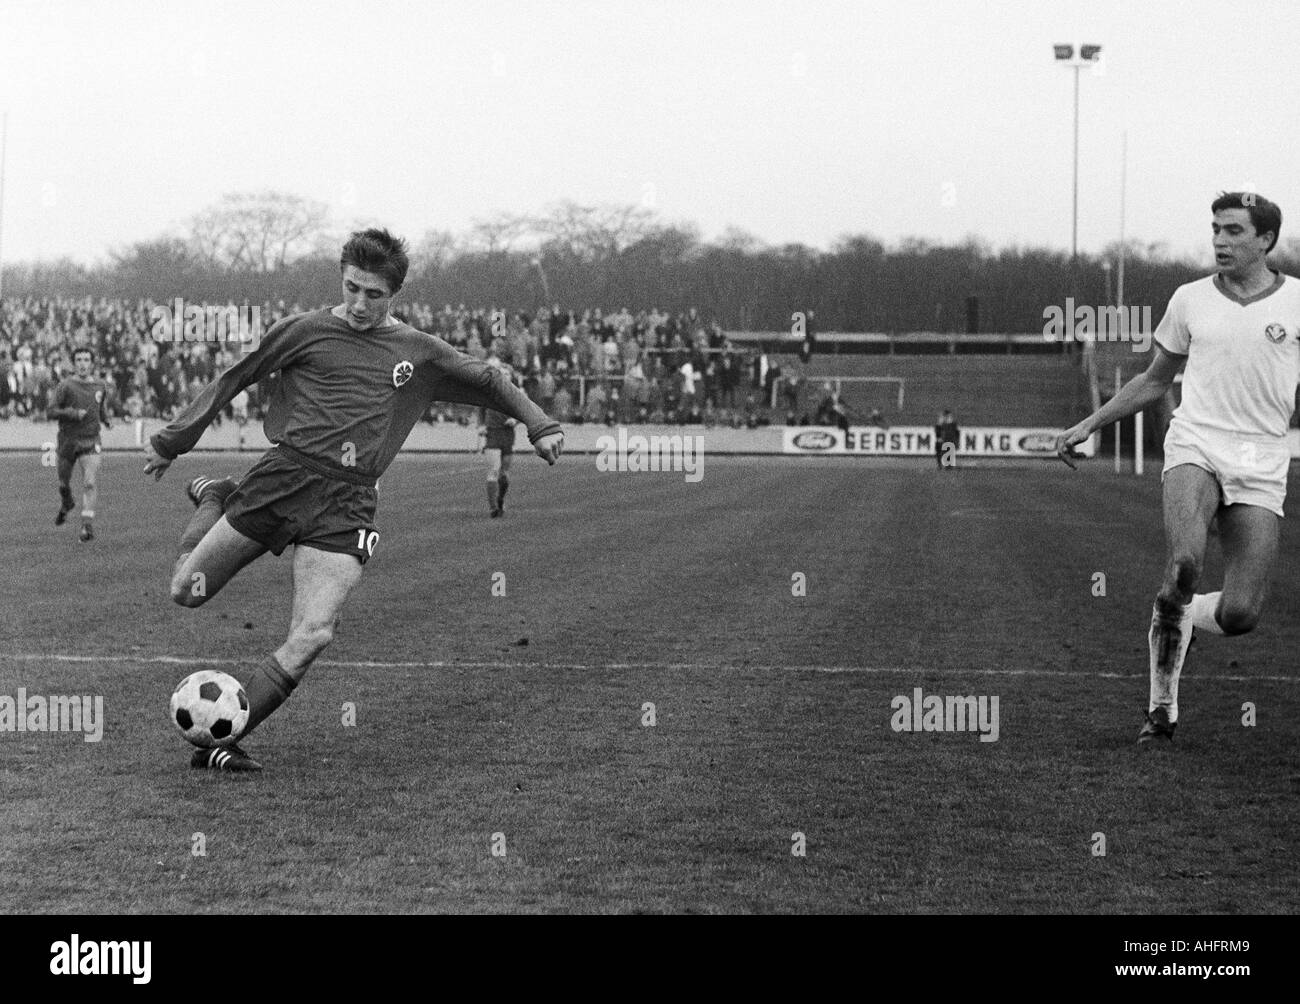 football, Regionalliga West, 1967/1968, Rot-Weiss Oberhausen versus TSV Marl-Huels 3:1, Niederrhein Stadium in Oberhausen, scene of the match, left Werner Ohm (RWO), right Guenter Peters (Marl) - Stock Image